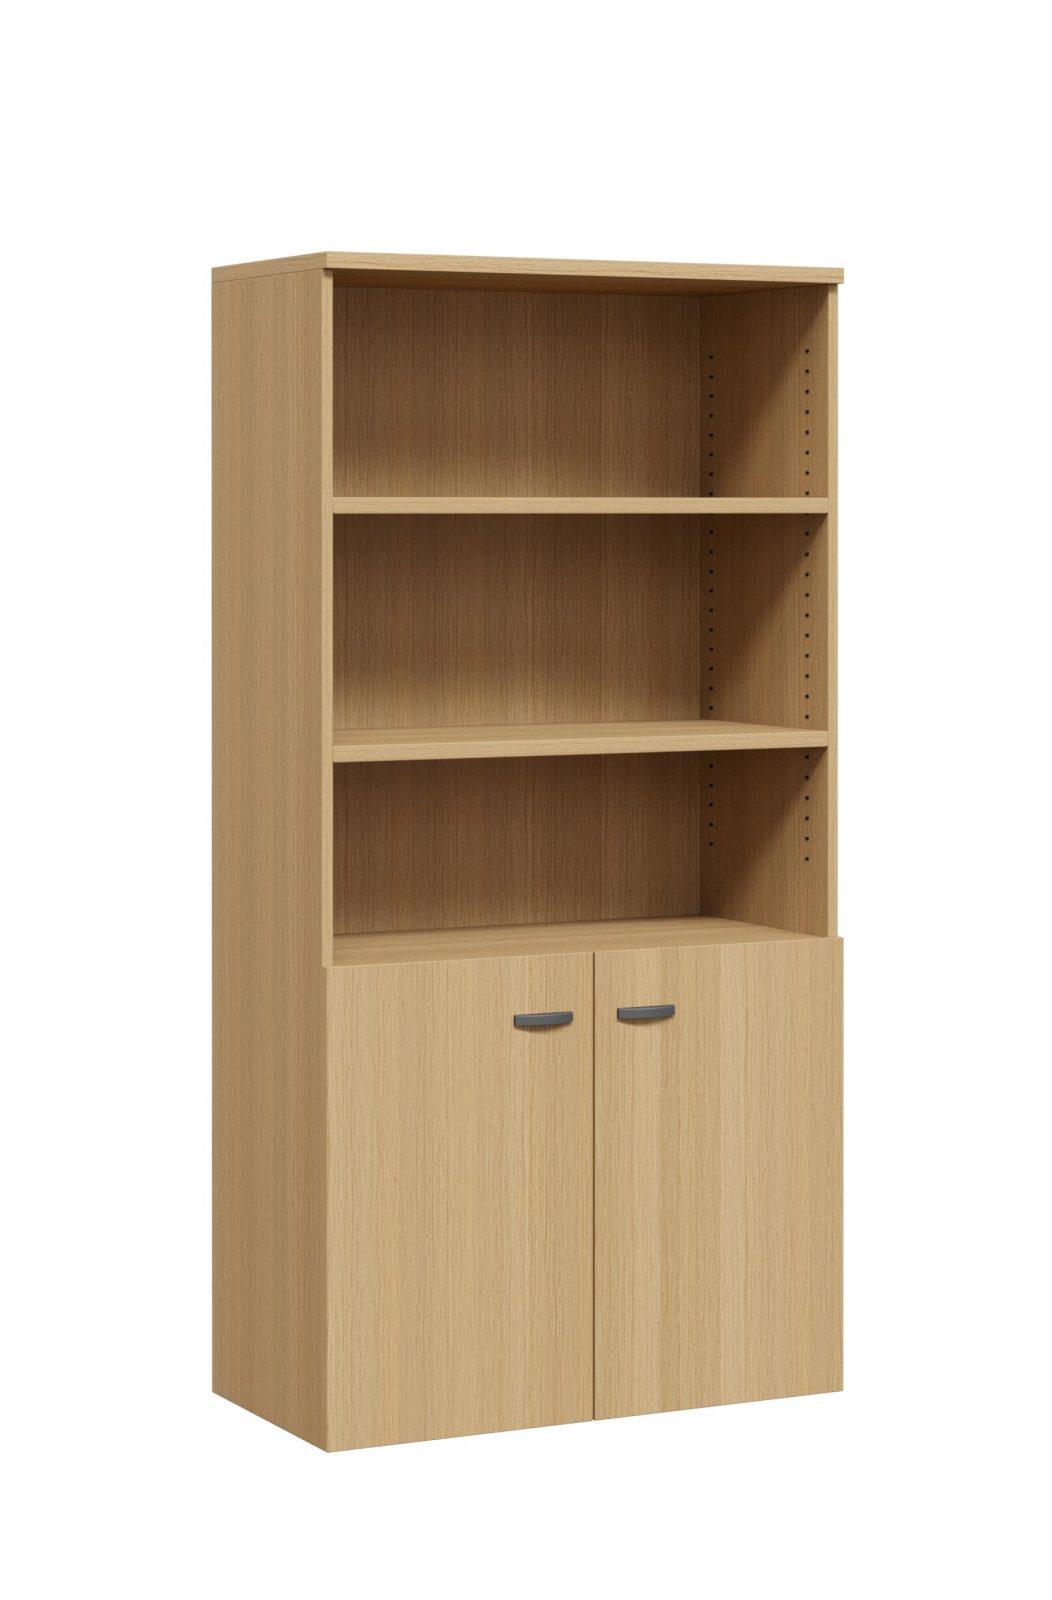 DD Bookcase Storage Cupboard